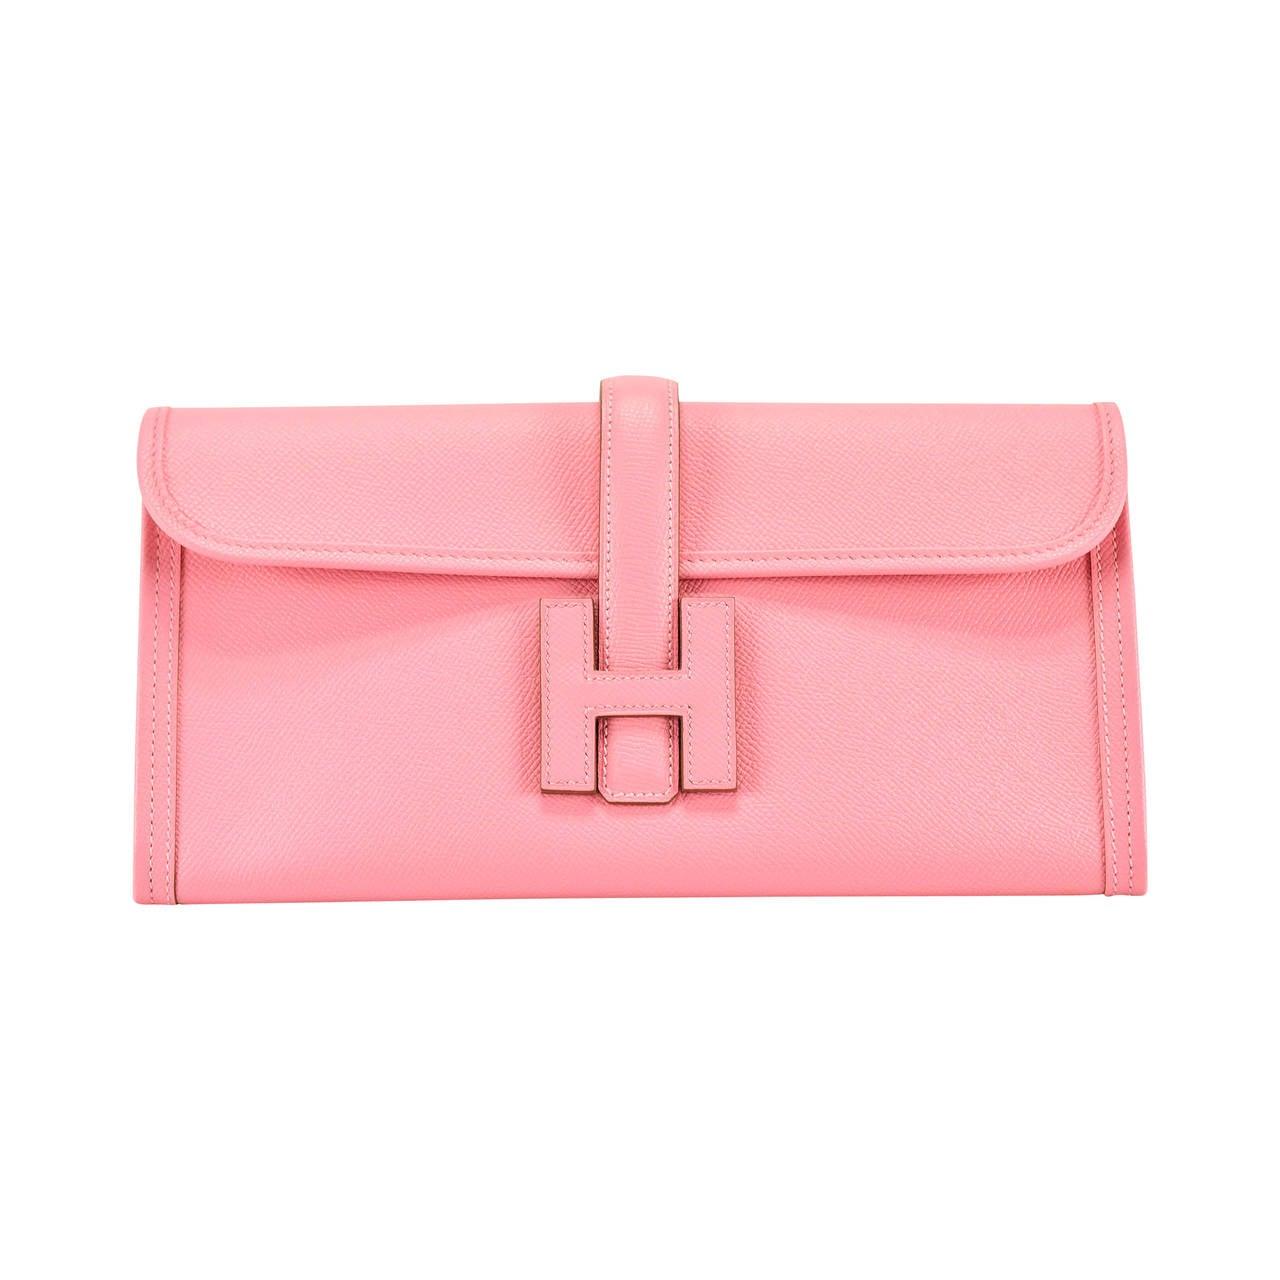 bag hermes price - Hermes Wallet JIGE ELAN 29 EPSOM PINK CONFETTI 2015. at 1stdibs